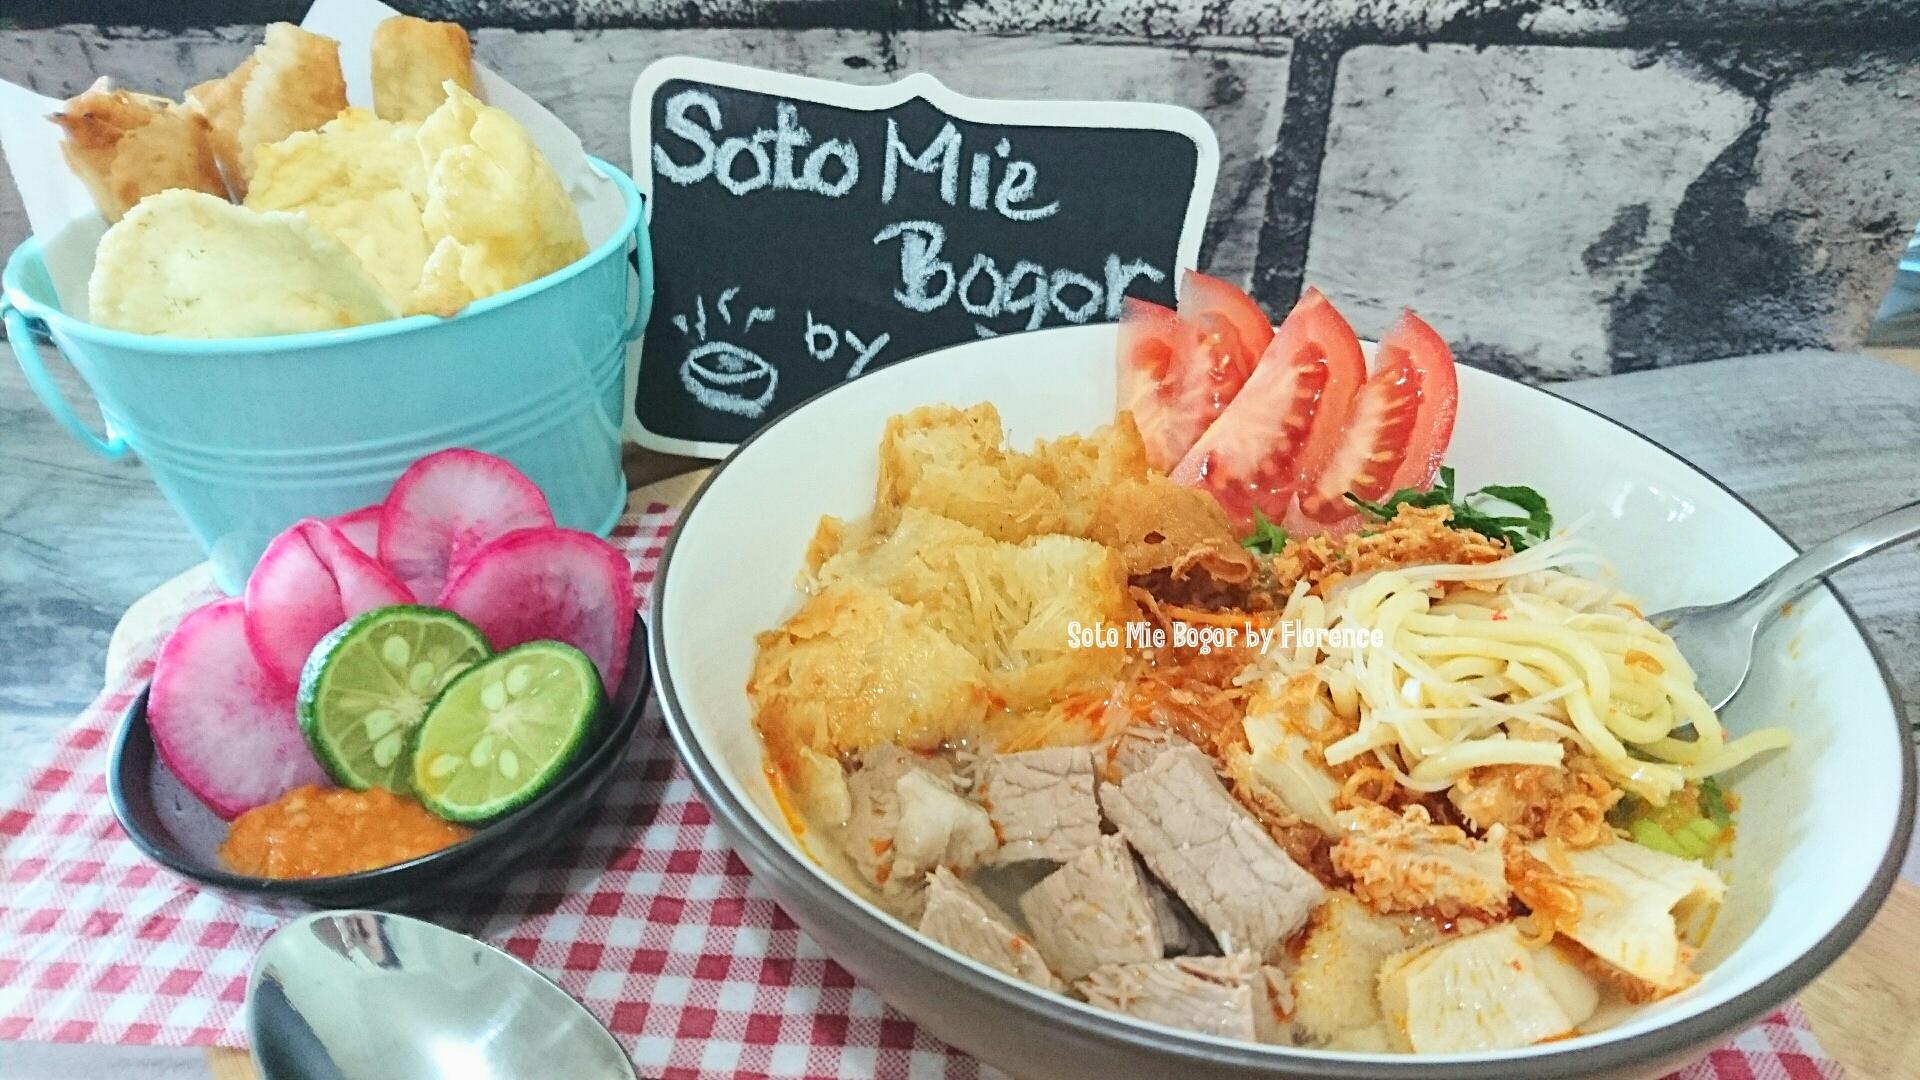 Soto Mie Bogor Bogors Noodle Soup Florences Home Cooking Adalah Makanan Khas Dr Kota Jawa Barat Rasanya Nikmat Original Food From City West Java Taste So Good